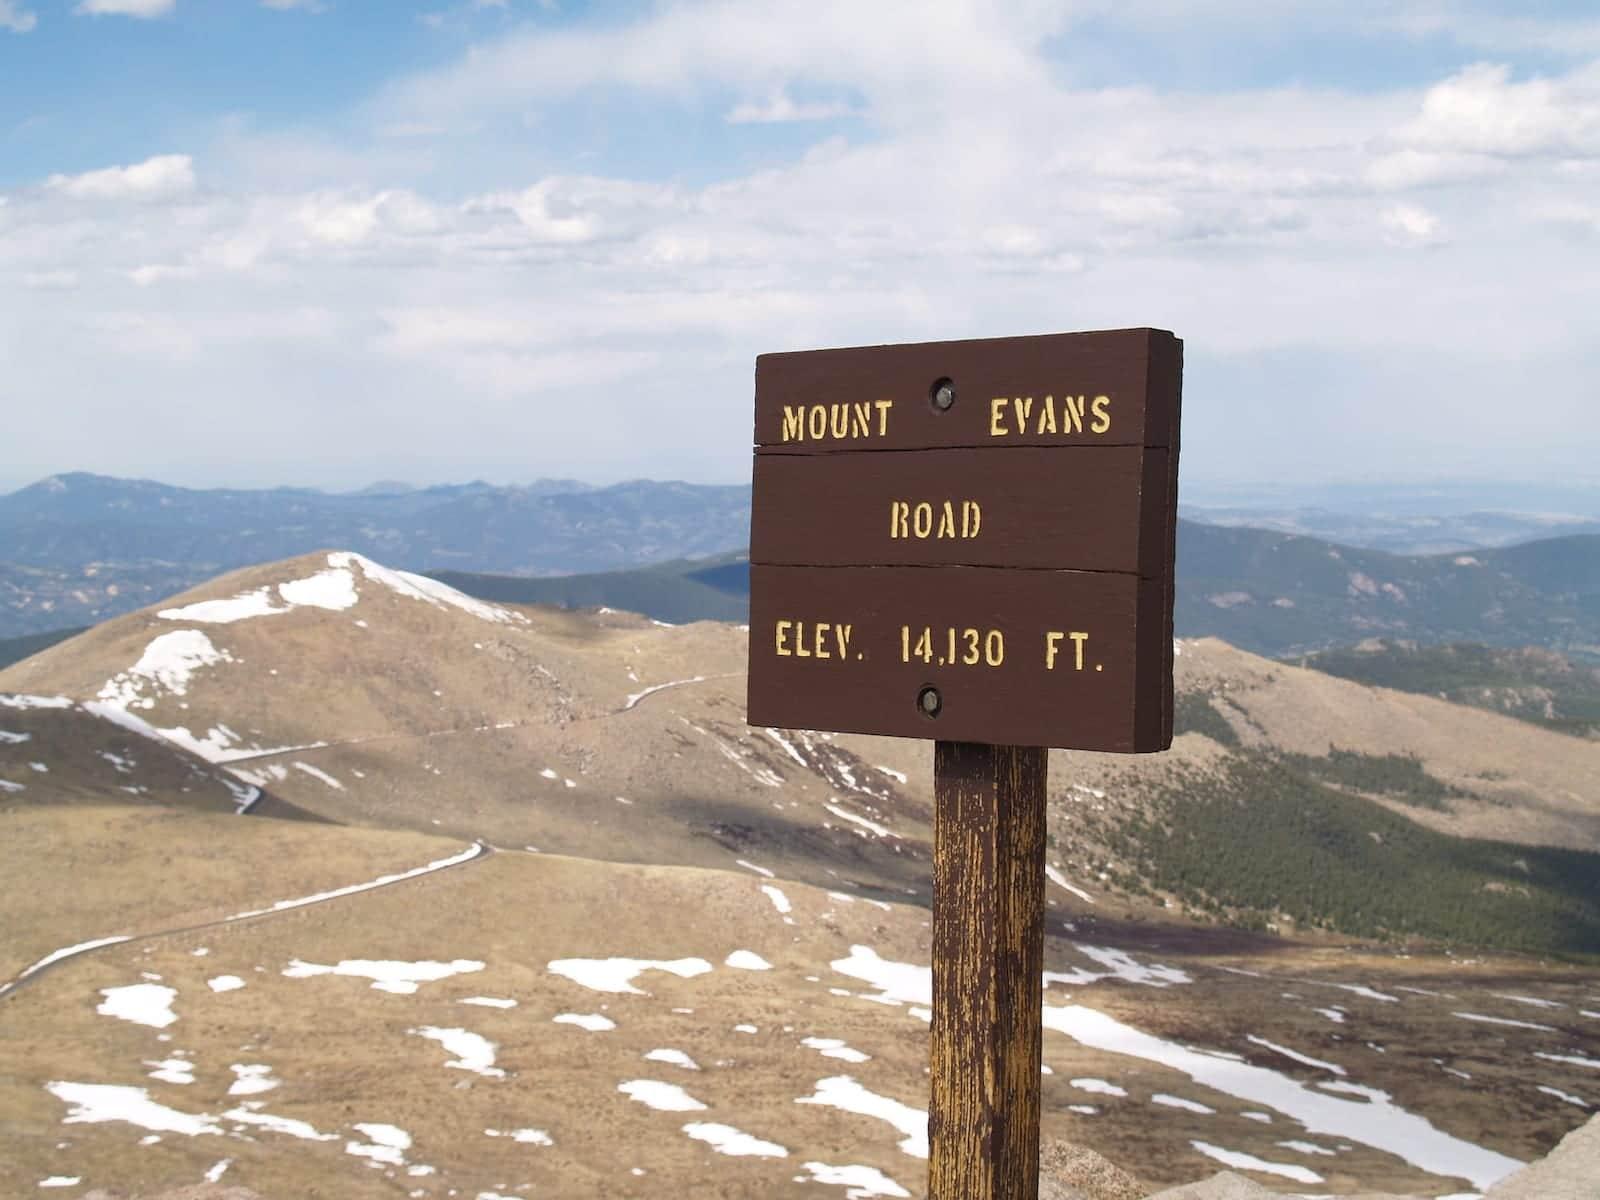 Mount Evans Road Highest Colorado Paved Drive